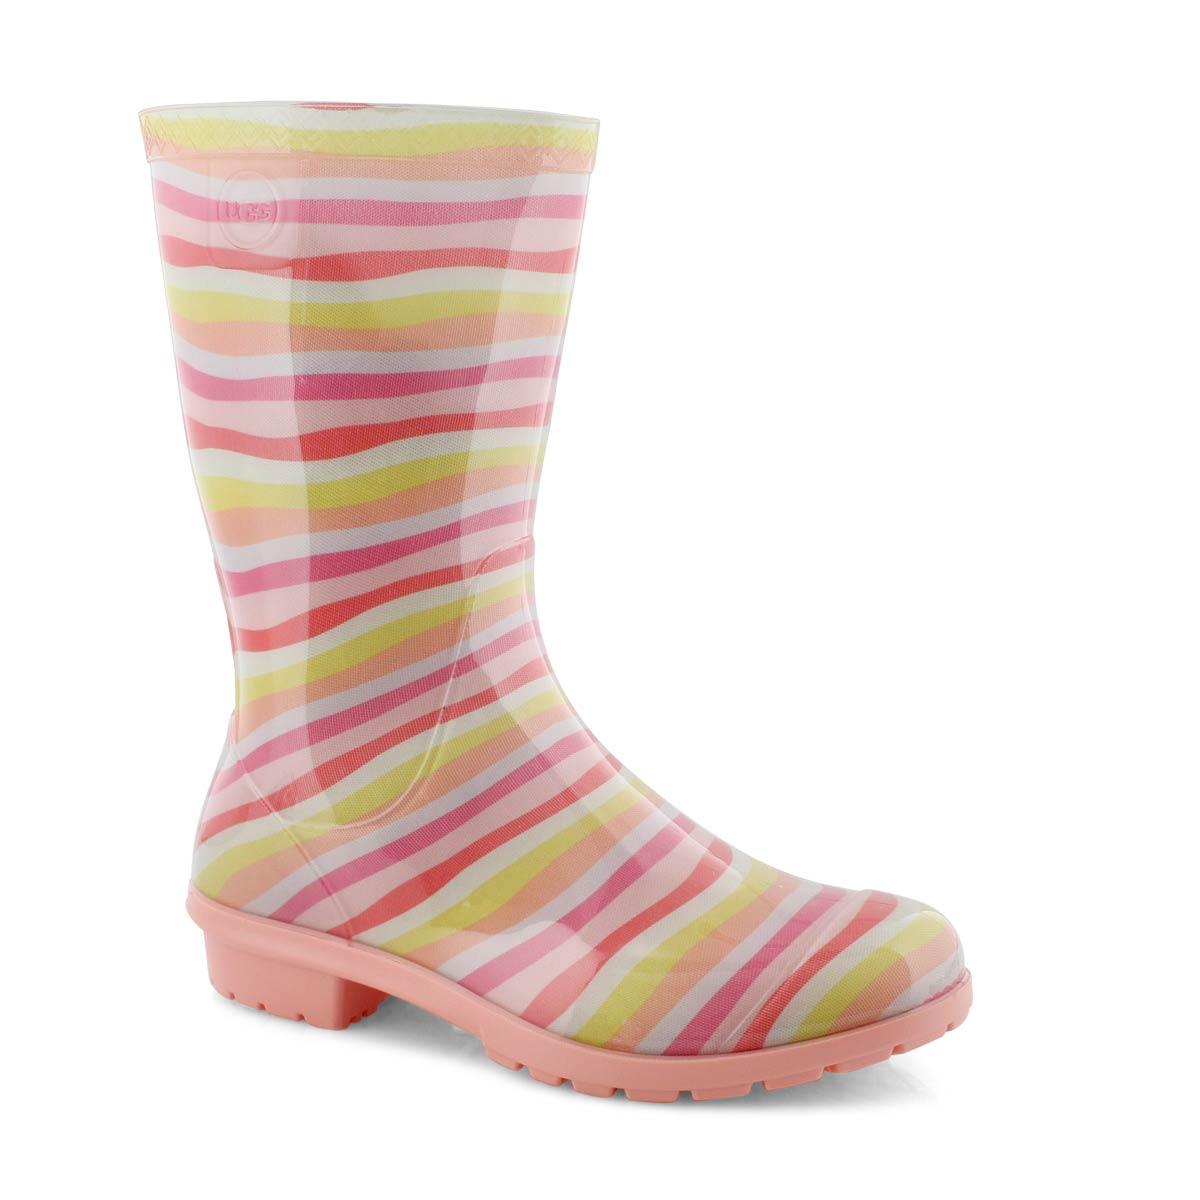 Grls Raana Mural rainbow wtpf rain boot